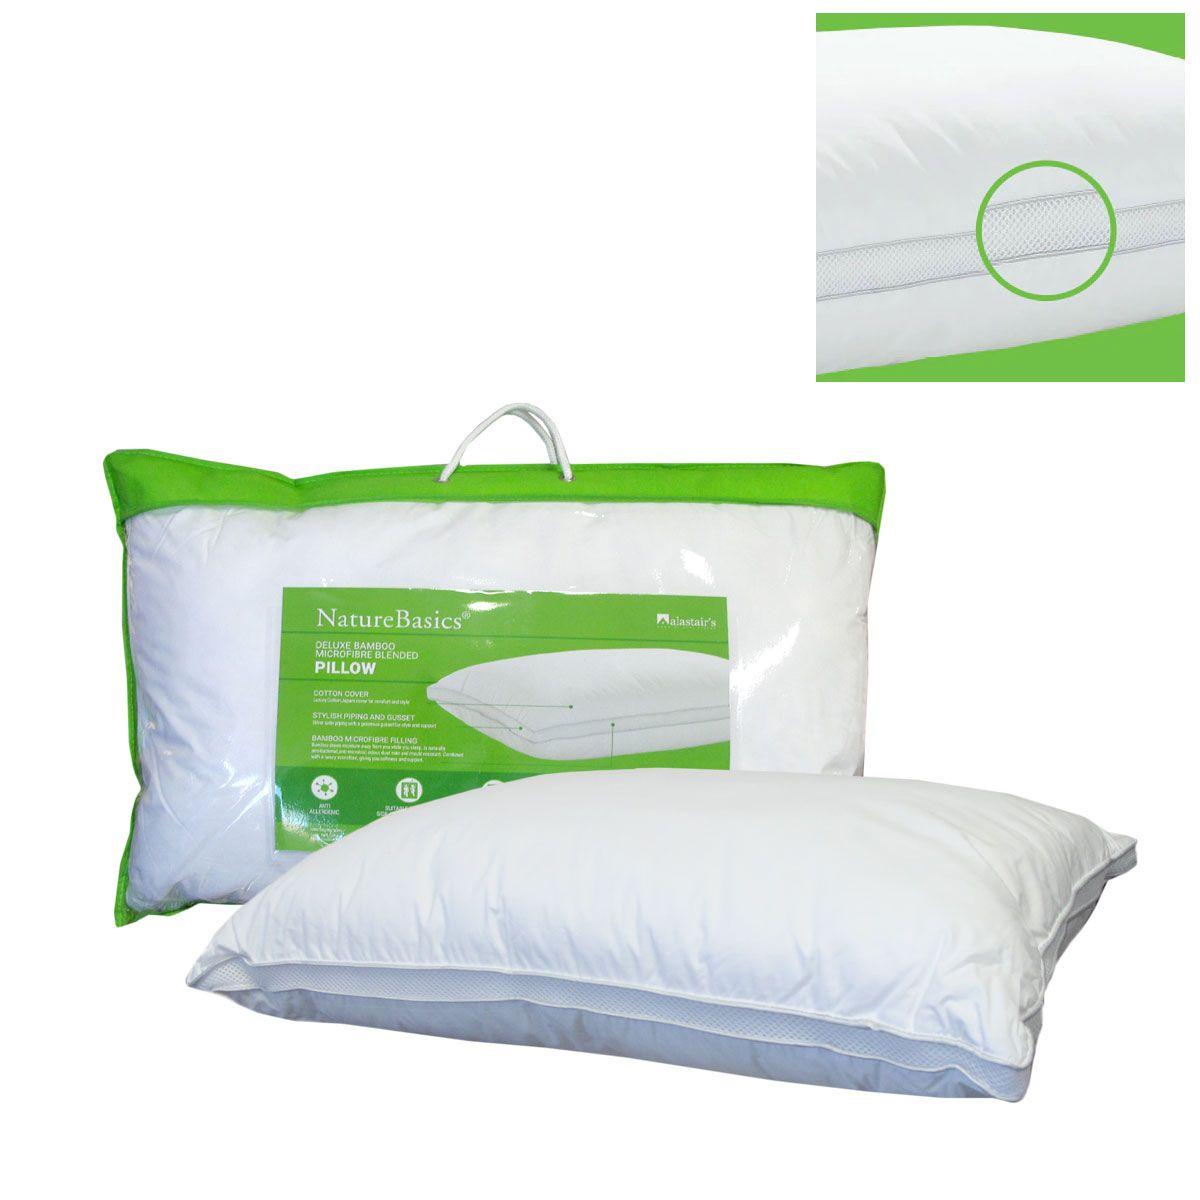 Alastairs Nature Basics Memory Foam Medium Profile PillowBamboo Cover